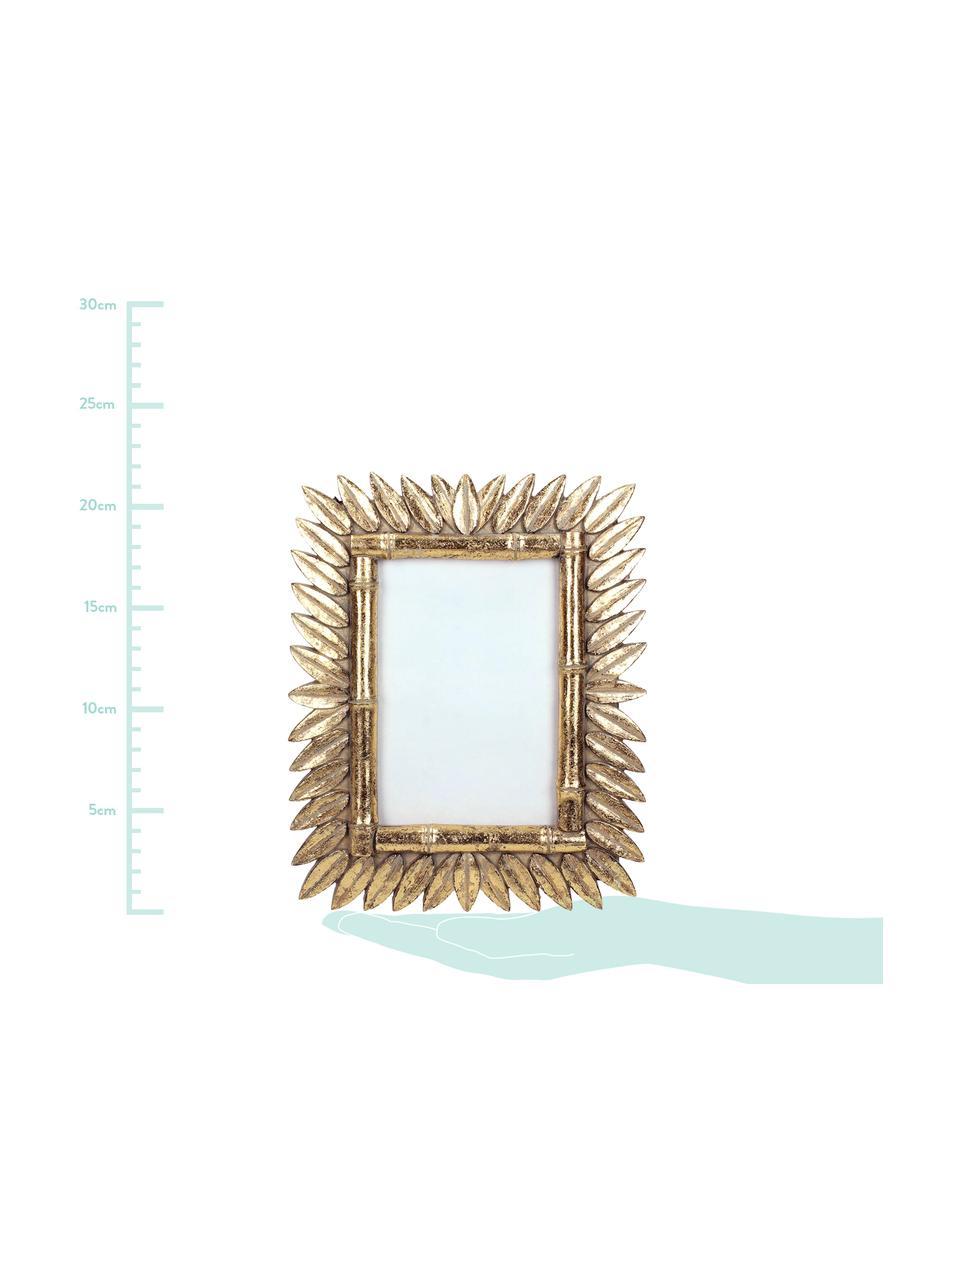 Bilderrahmen Sun in Antik-Optik, Rahmen: Polyresin, Front: Glas, Rückseite: Mitteldichte Holzfaserpla, Messingfarben, 9 x 13 cm